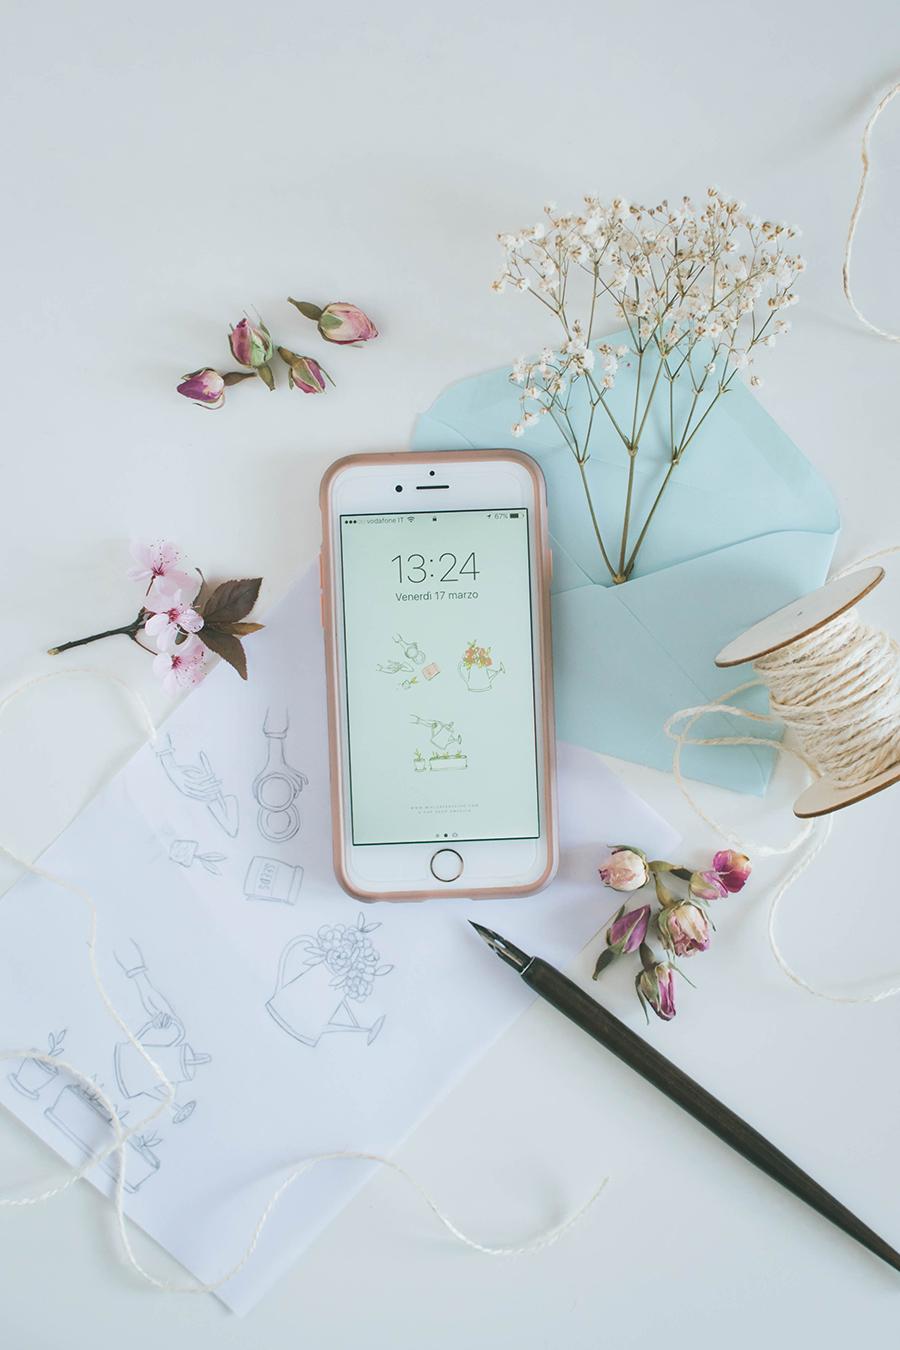 Spring Wallpaper Free Download iPhone Smartphone